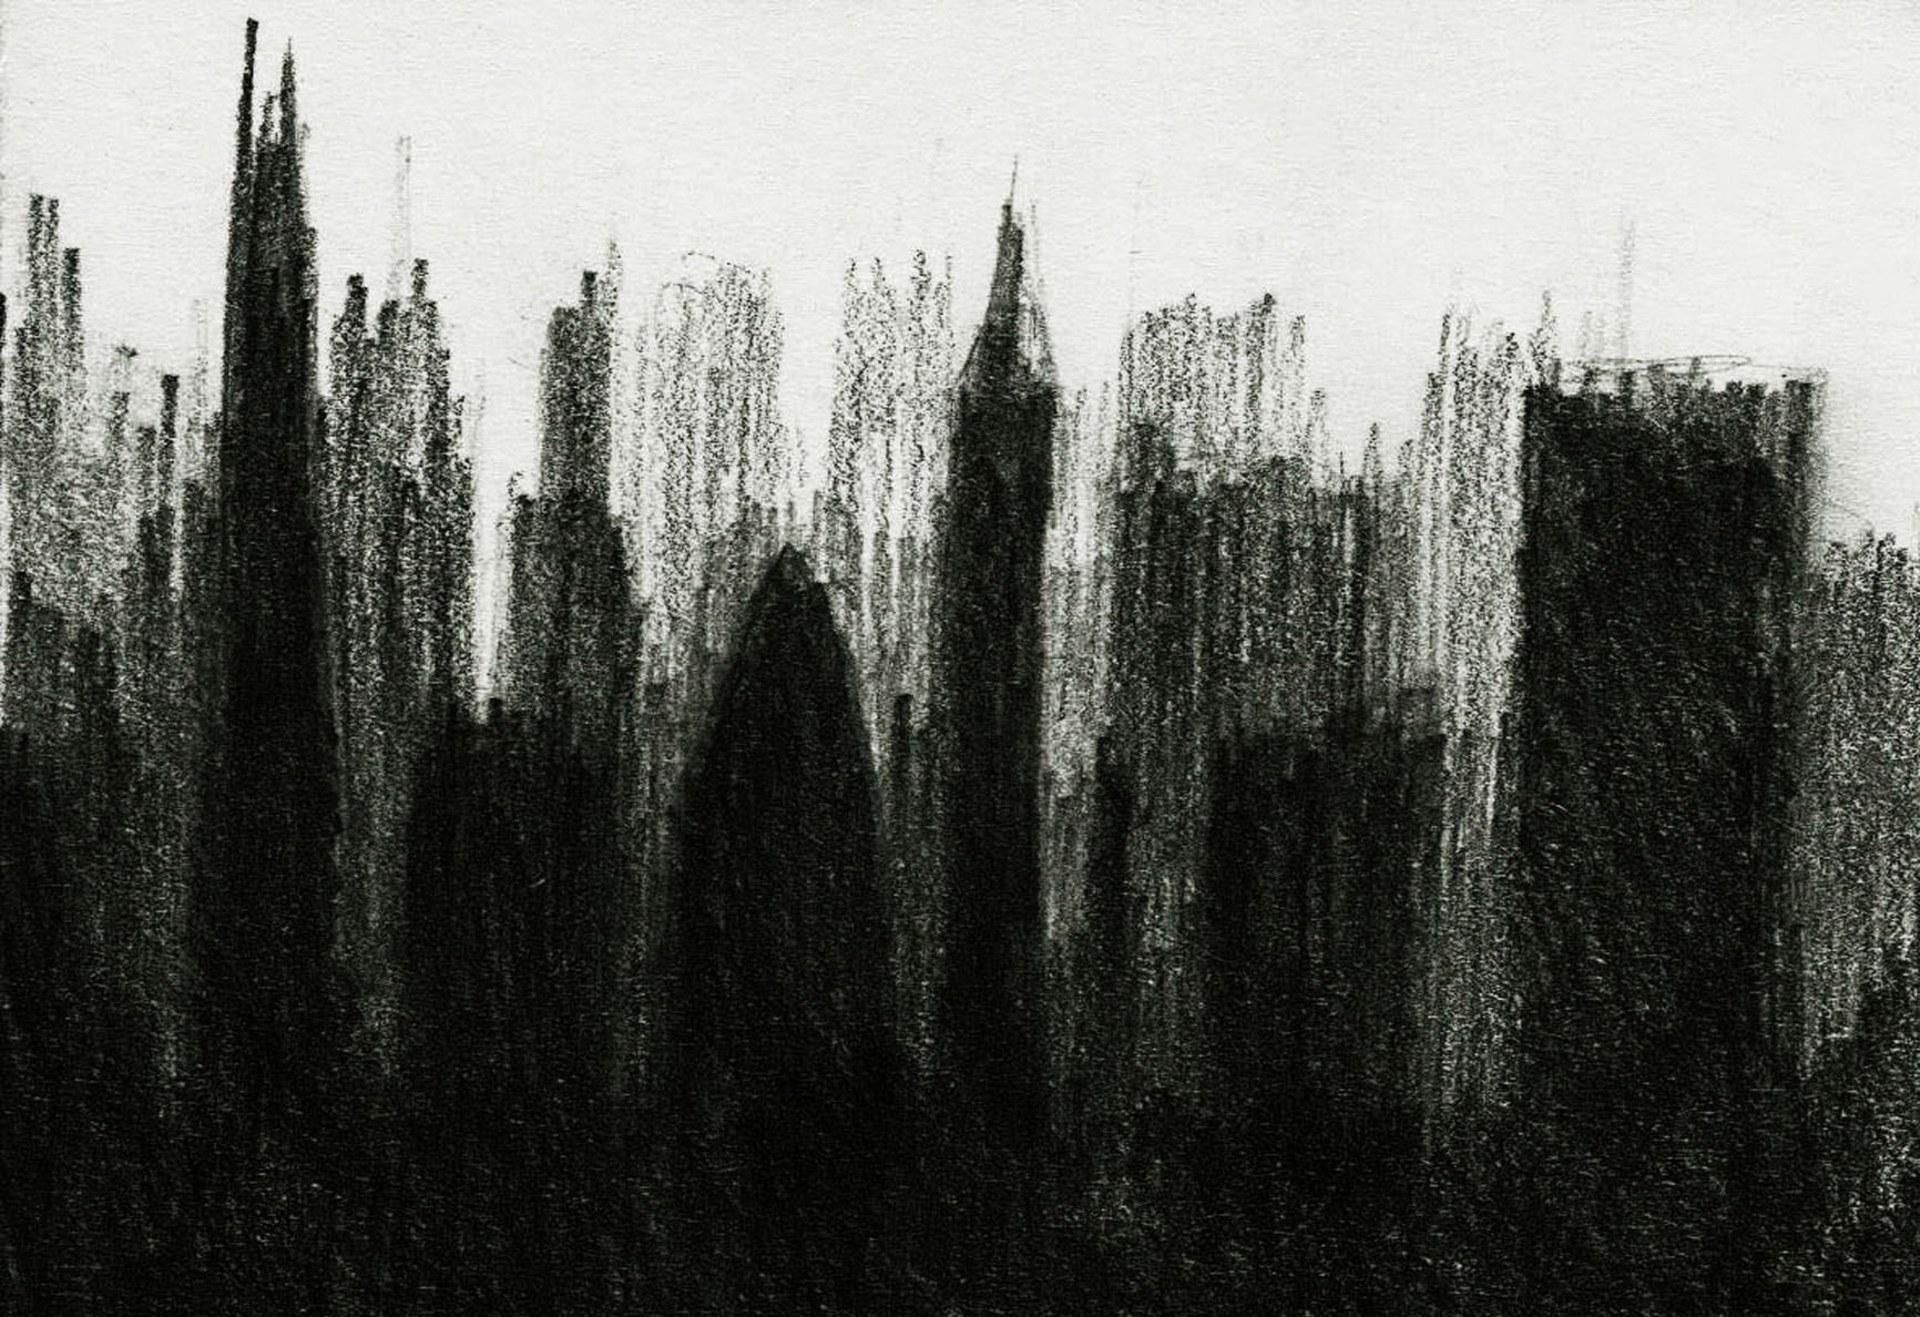 Imaginary Skyline